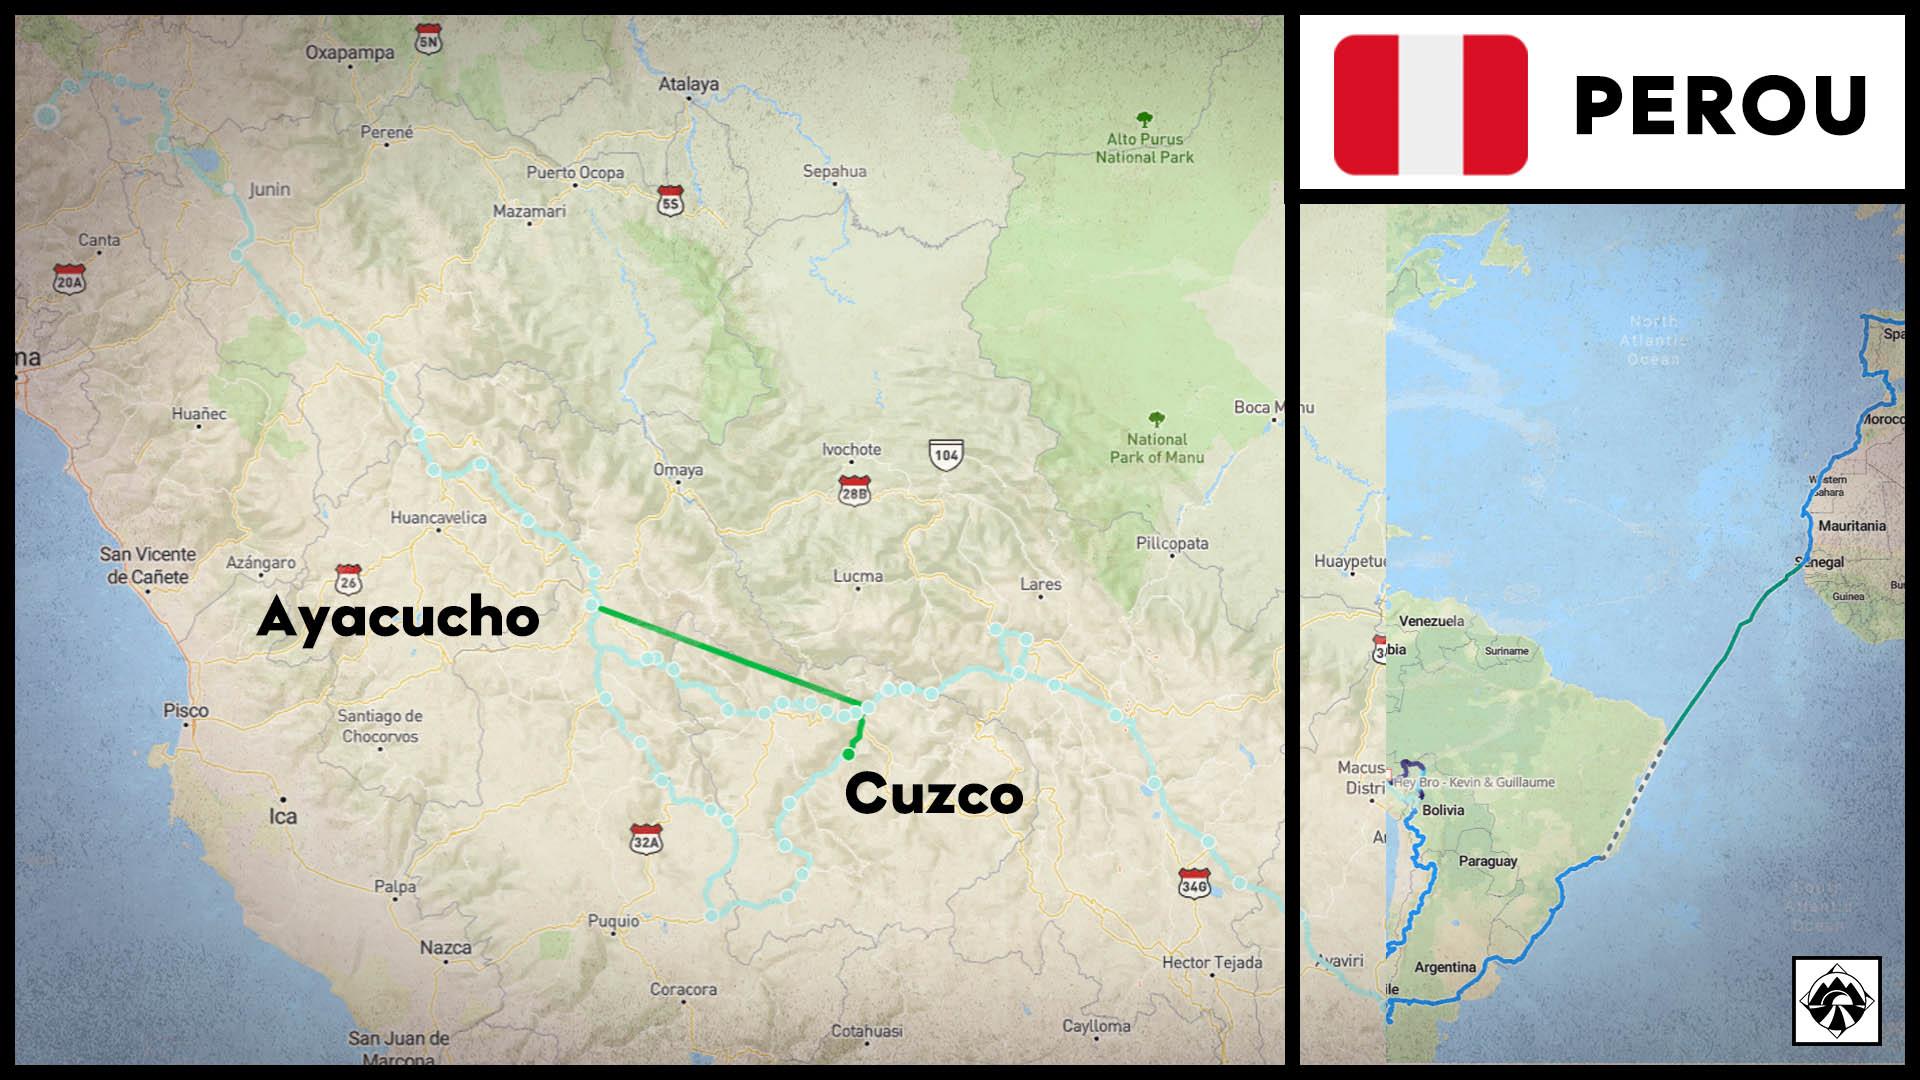 A&G - Travel Map mars 2020 Pérou